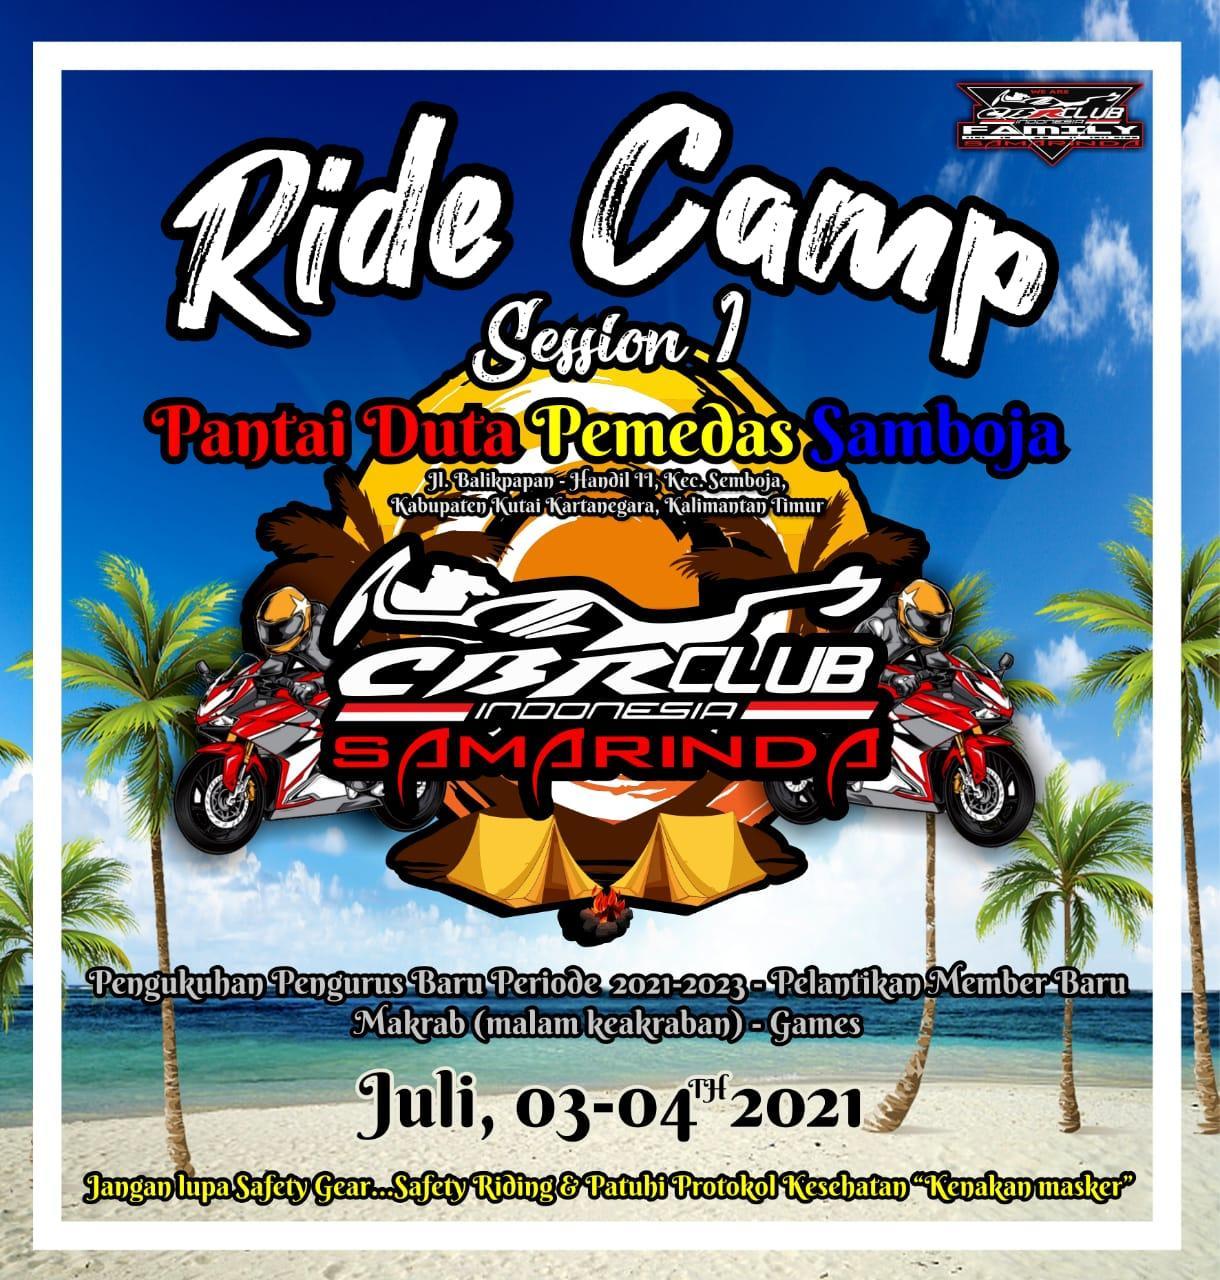 CBR Club Indonesia Region Samarinda Ride Camp